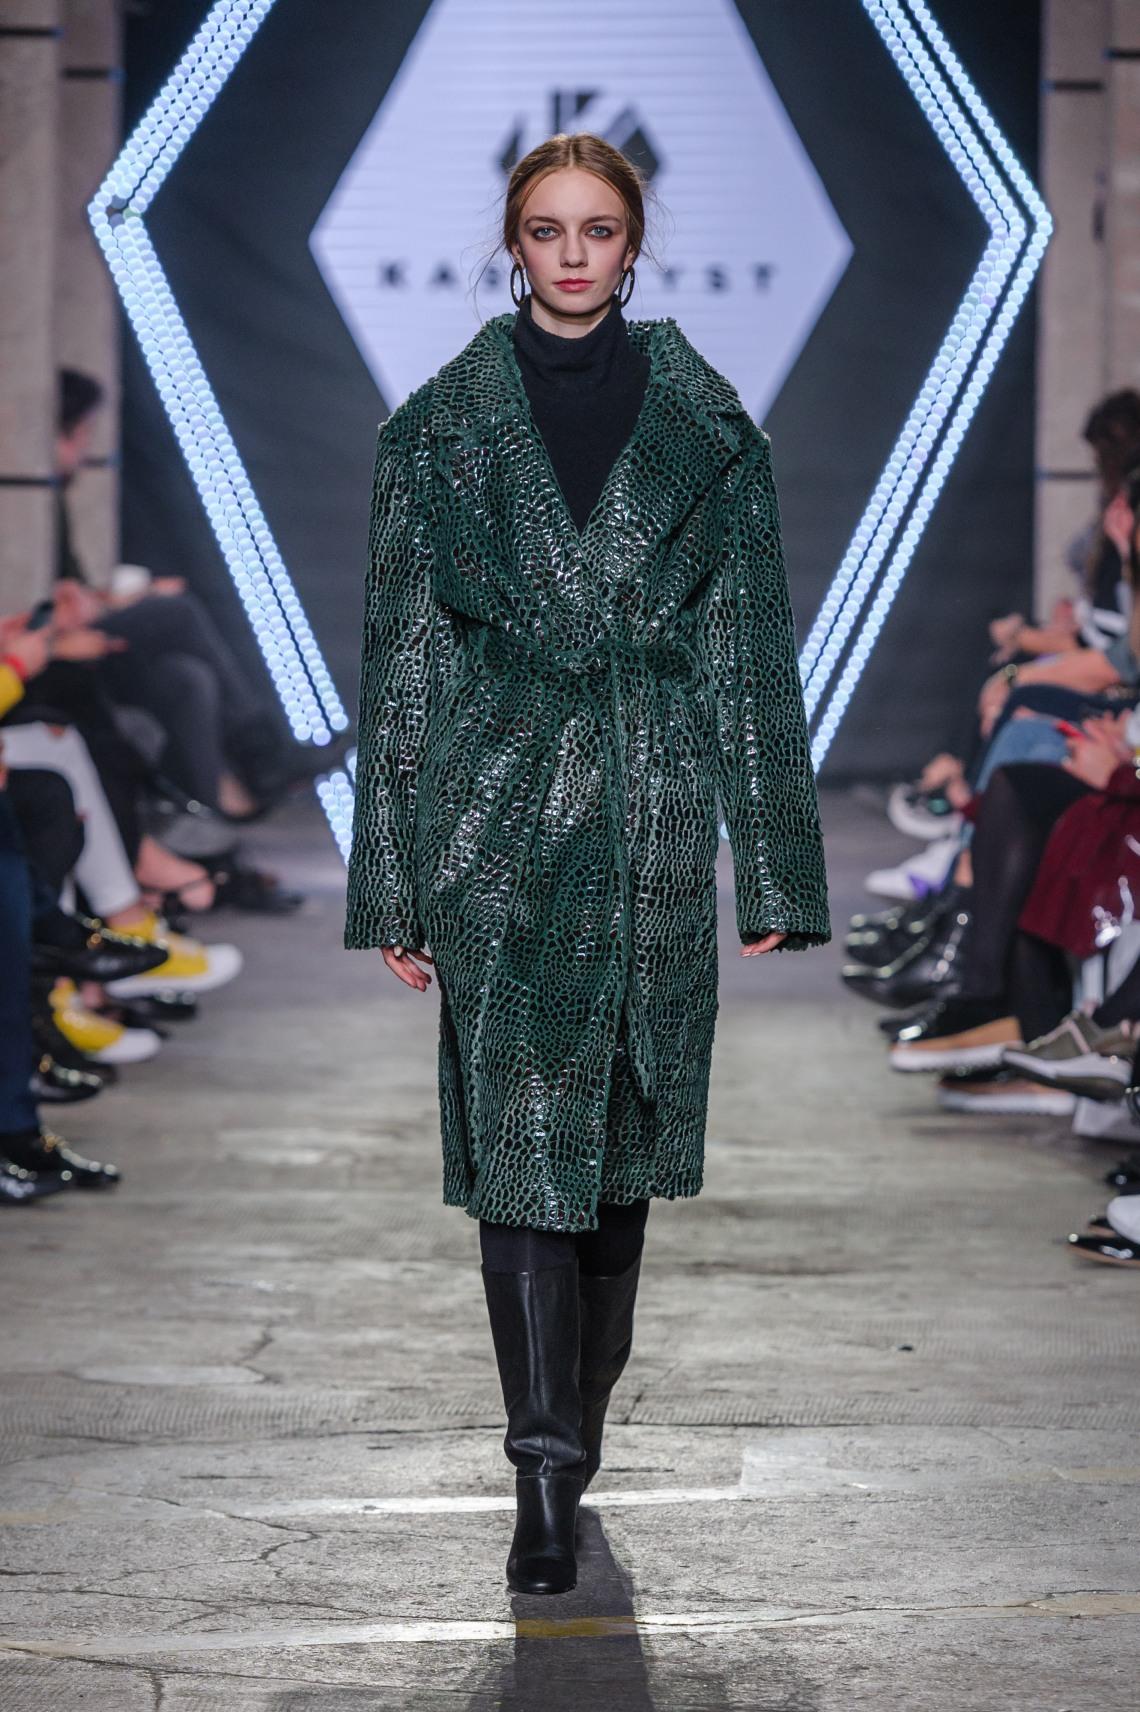 2ktw-101118_15-kaskryst_highres_fotfilipokopny-fashionimages